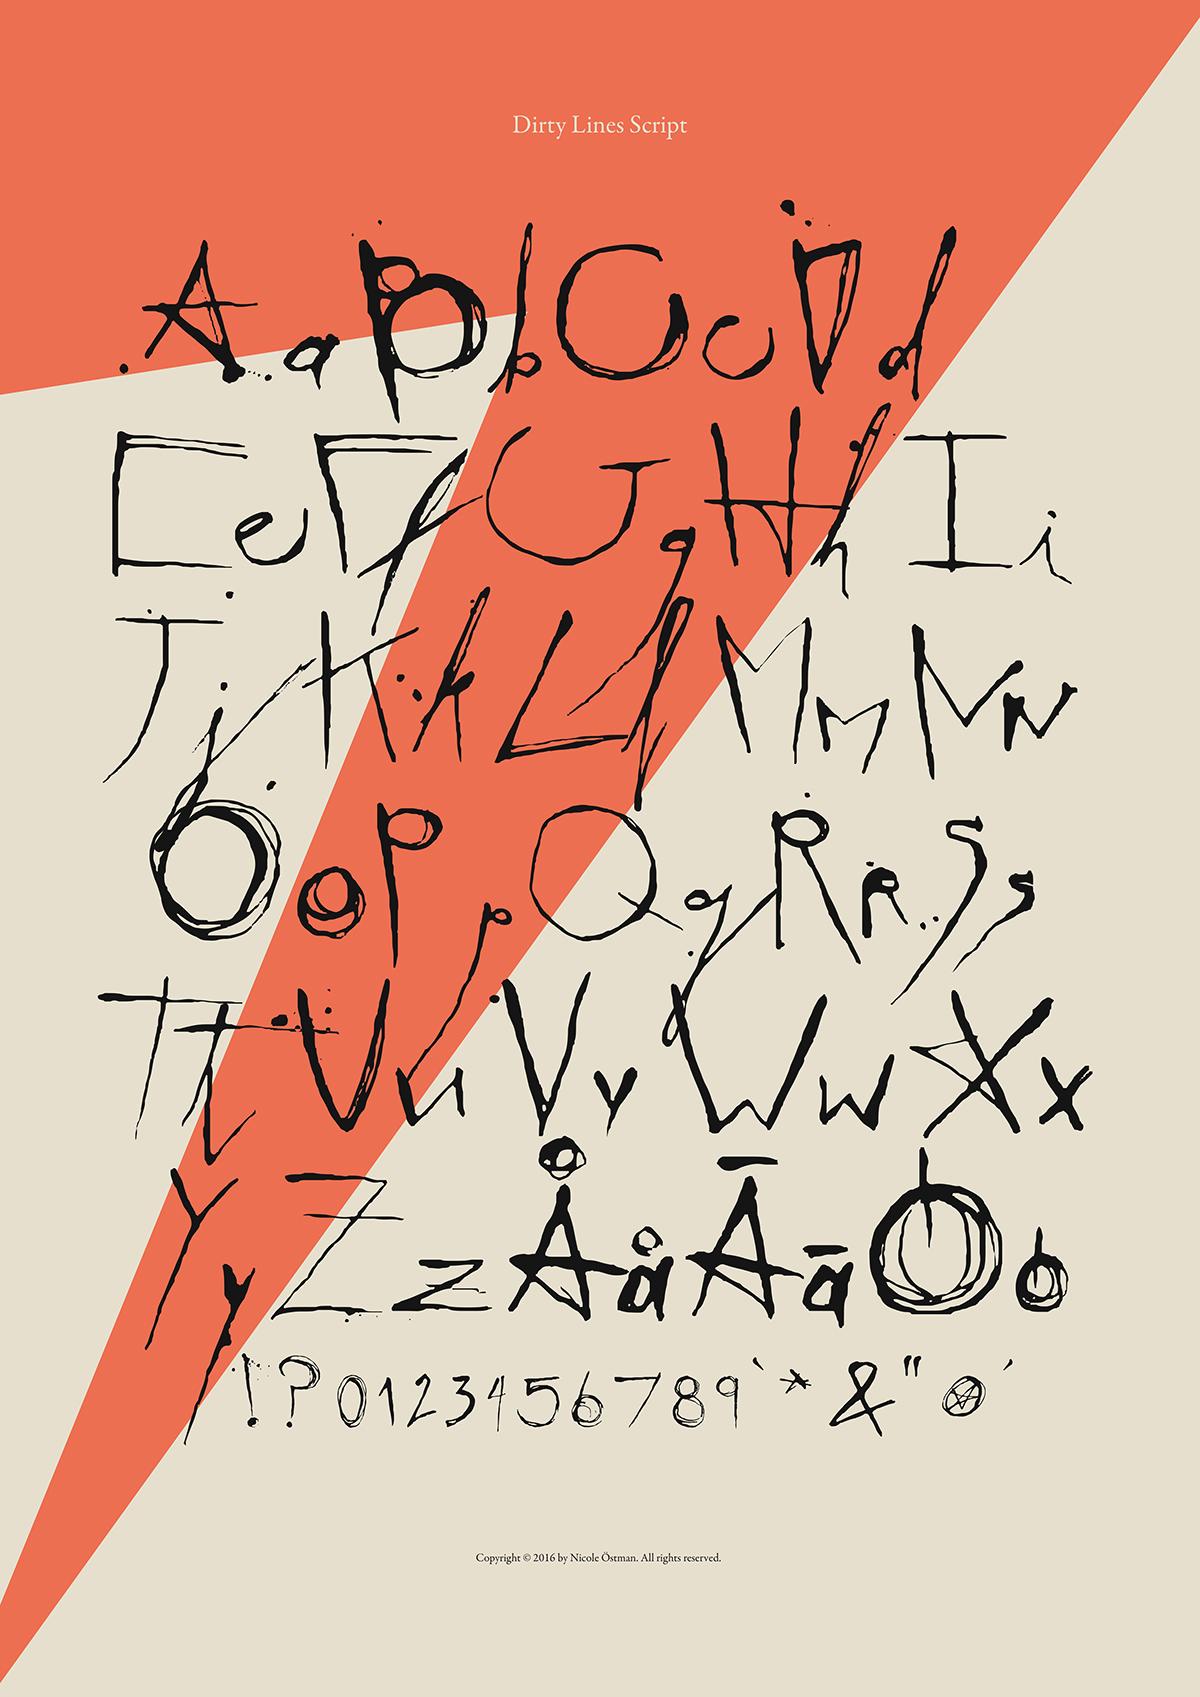 Dirty Lines Script font